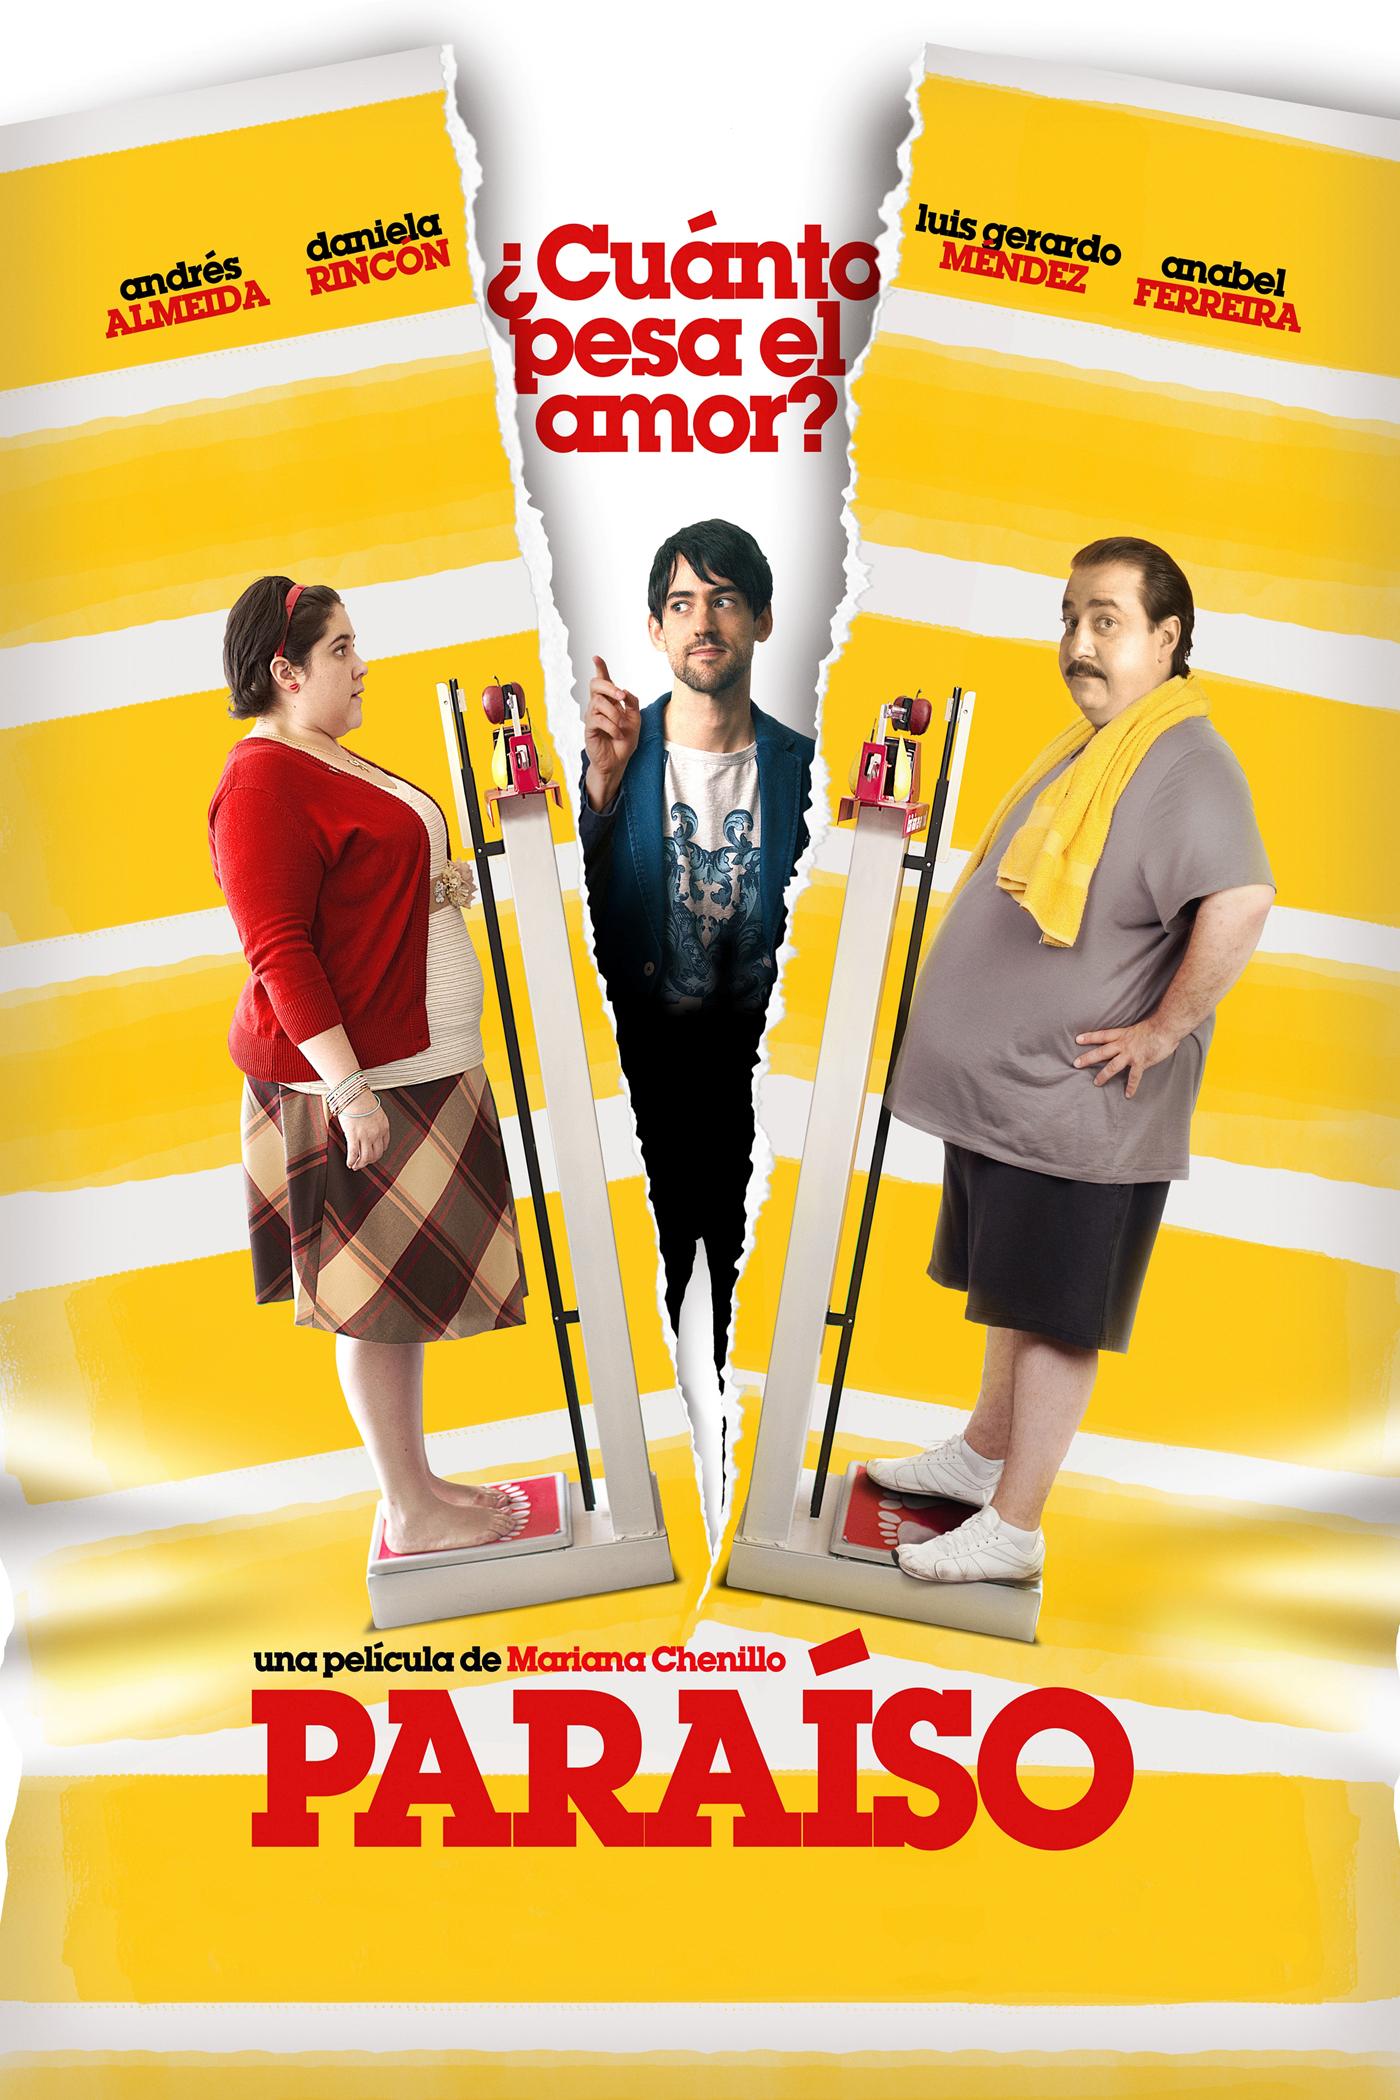 Poster-Paraiso.jpg